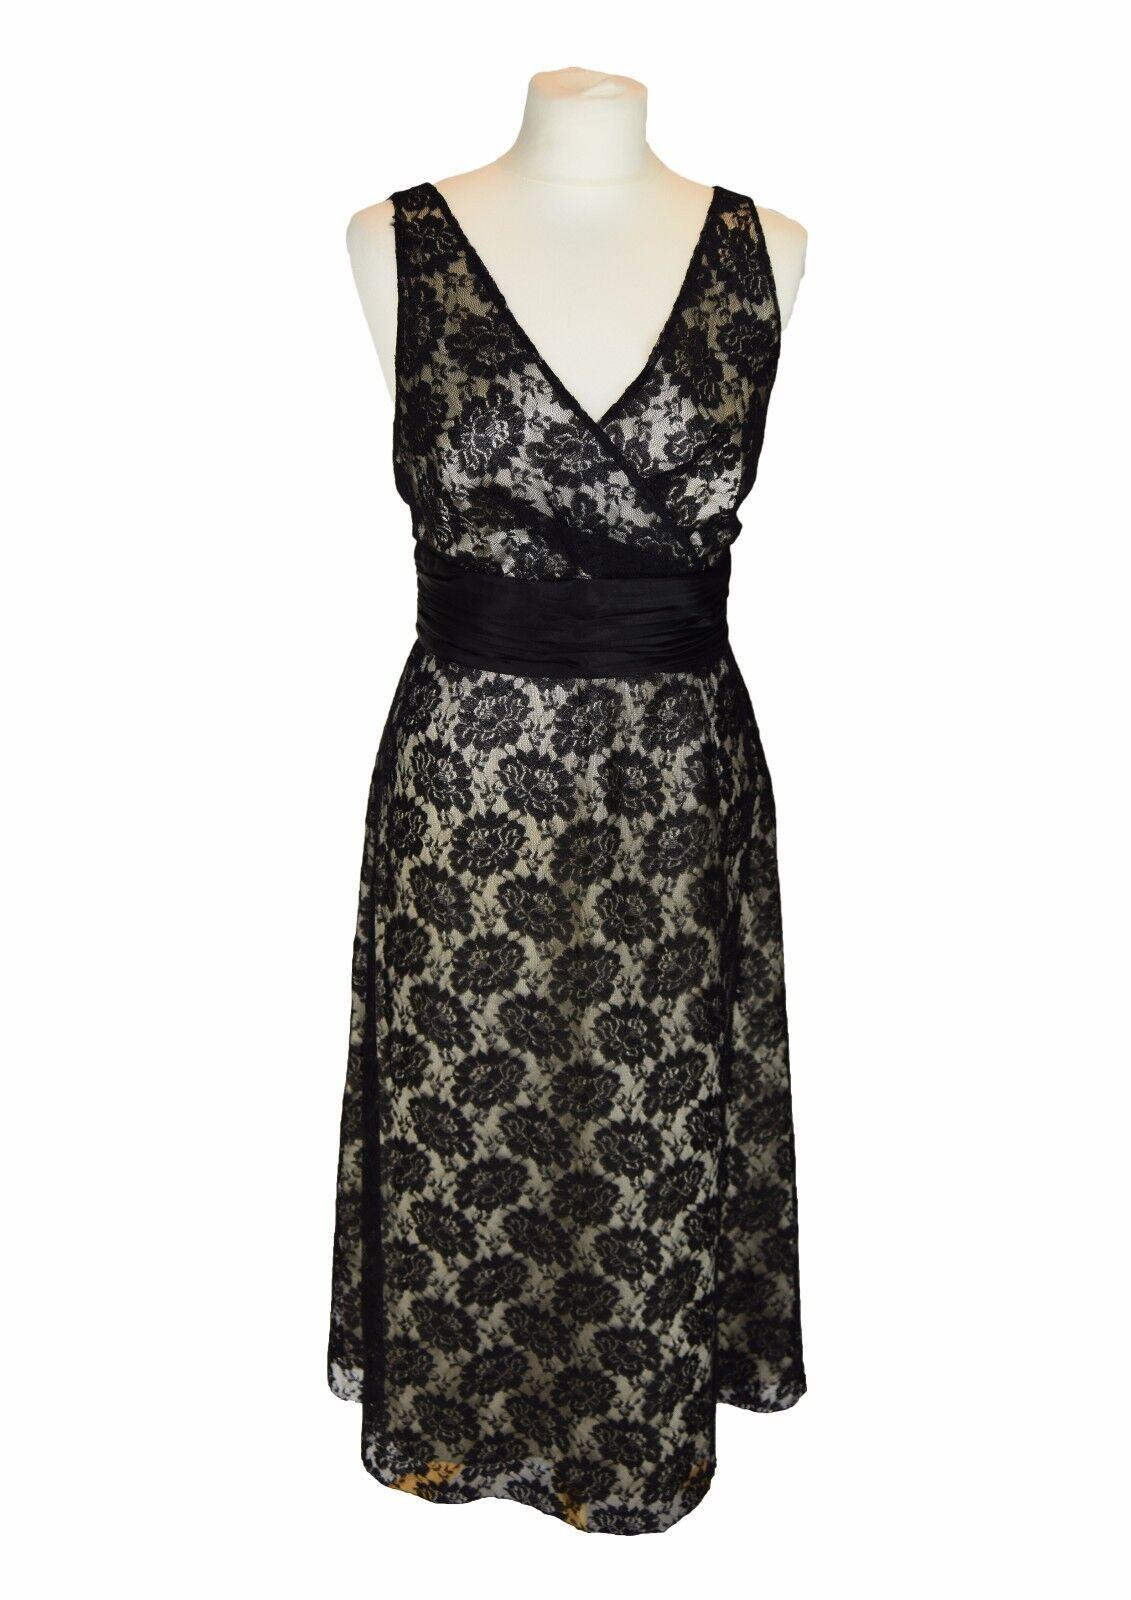 PHASE EIGHT NEW schwarz Lace Dress Dress Dress w. 100% Silk Waistband UK 14 EU 42 IT 46 7f2f32